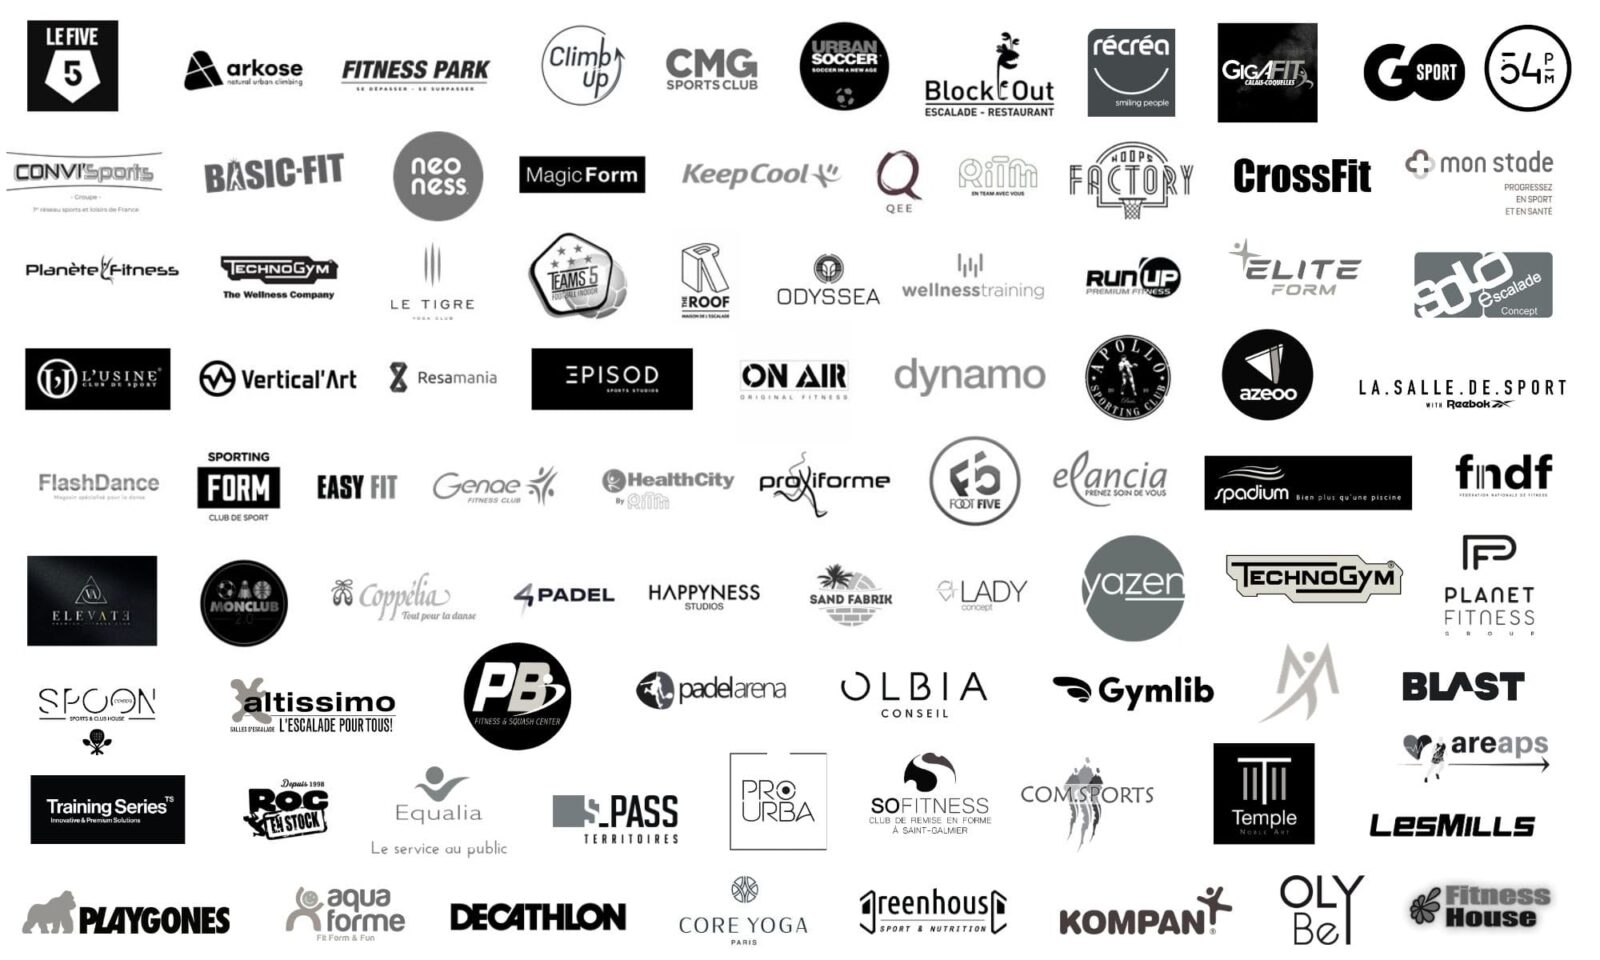 https://www.lesportestessentiel.com/wp-content/uploads/2021/04/Logos-marques-engagees-min-1-1600x960.jpg